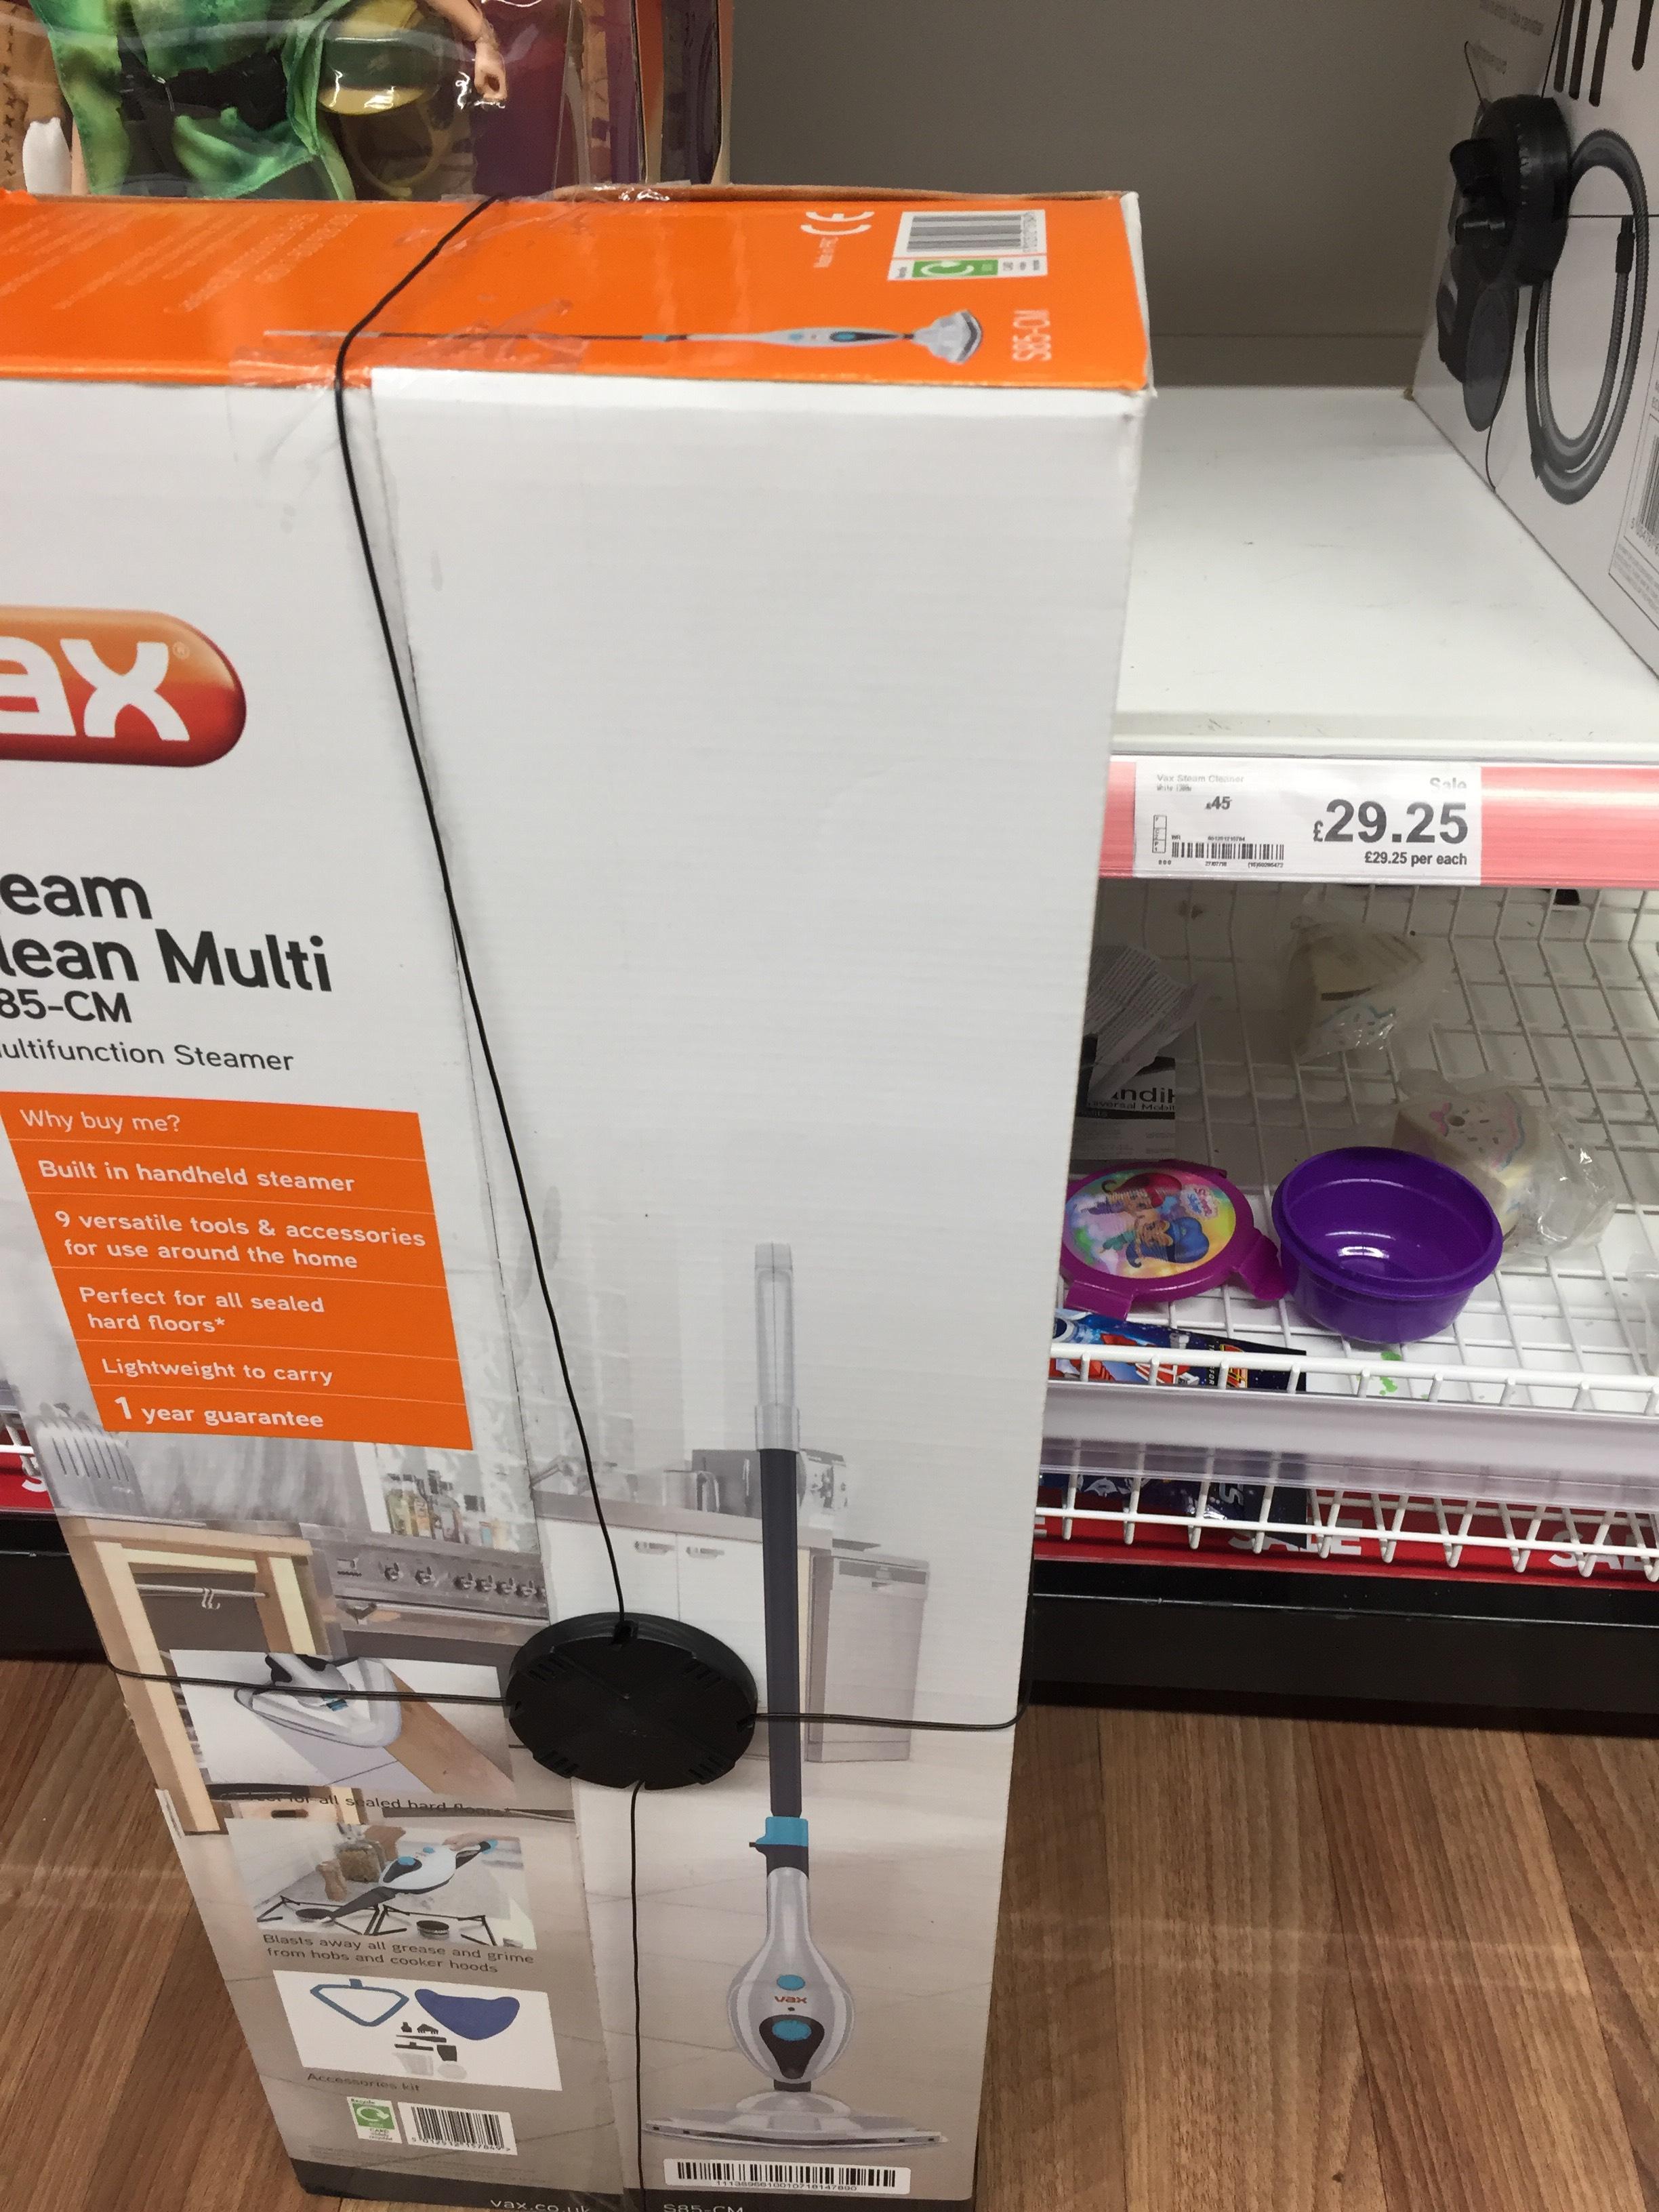 Vax Steam clean multi in Asda Sealand road Chester for £29.25